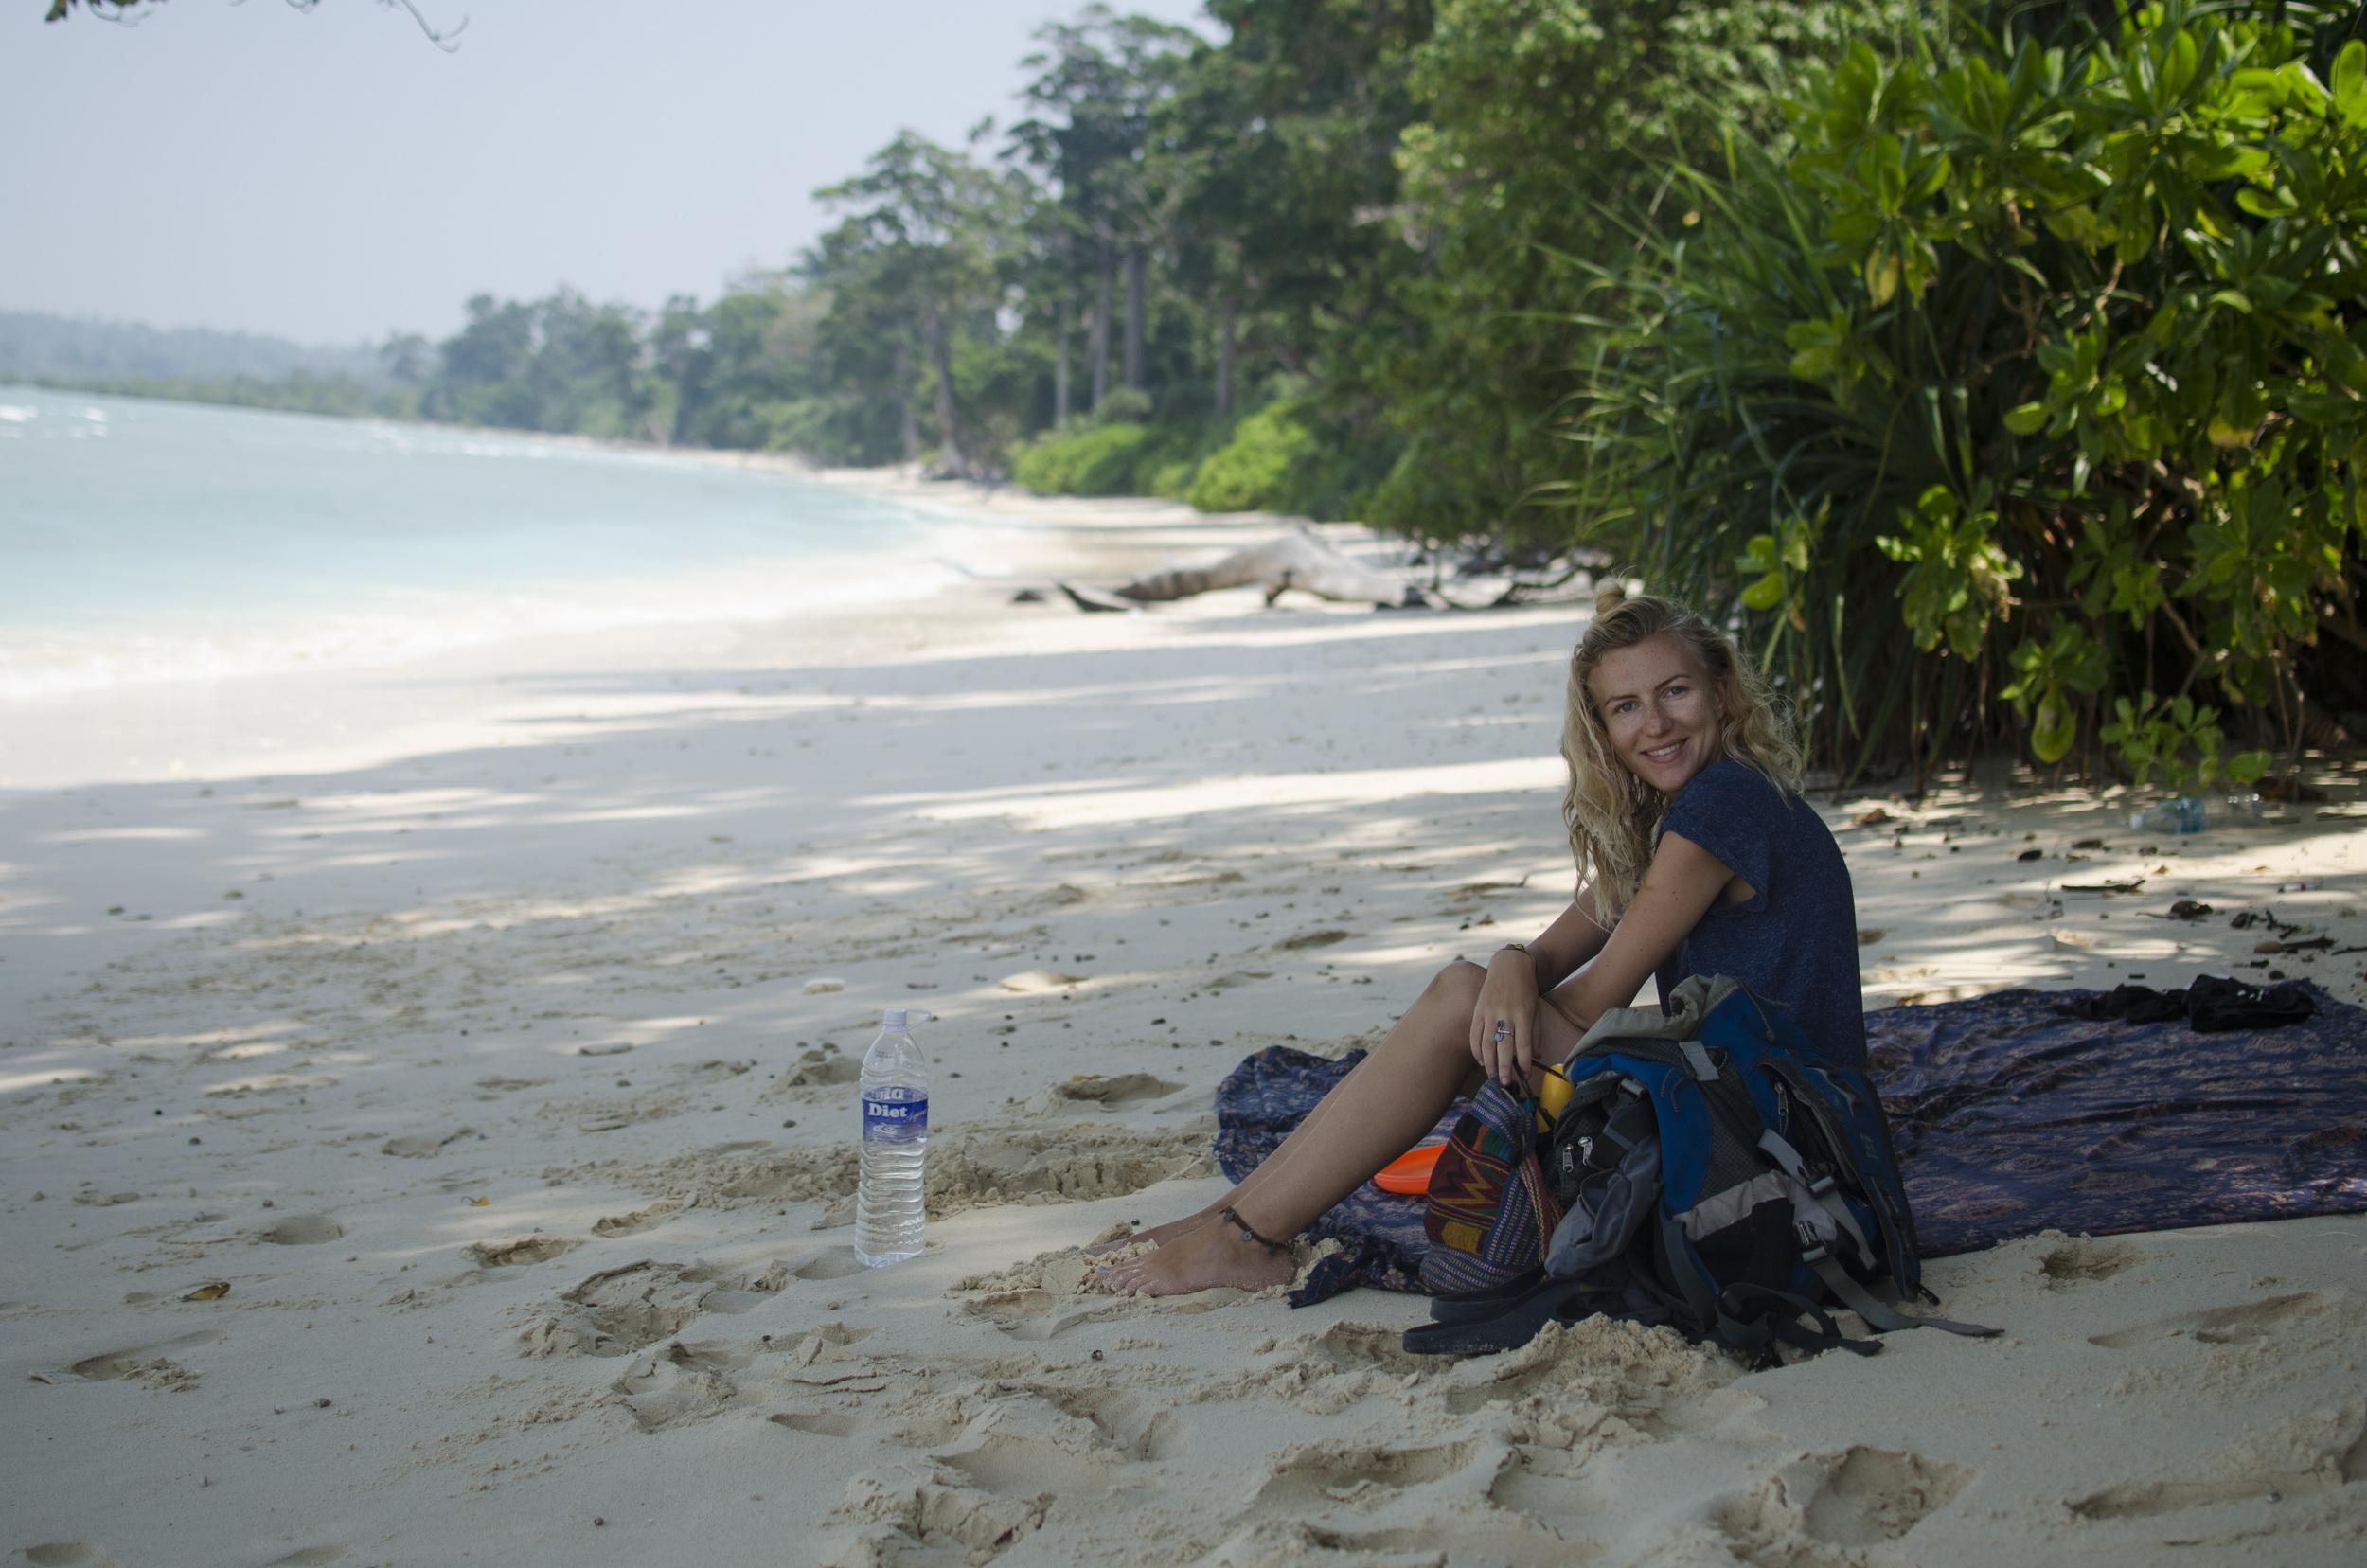 Neil Island (The Andaman Islands) - So We Go